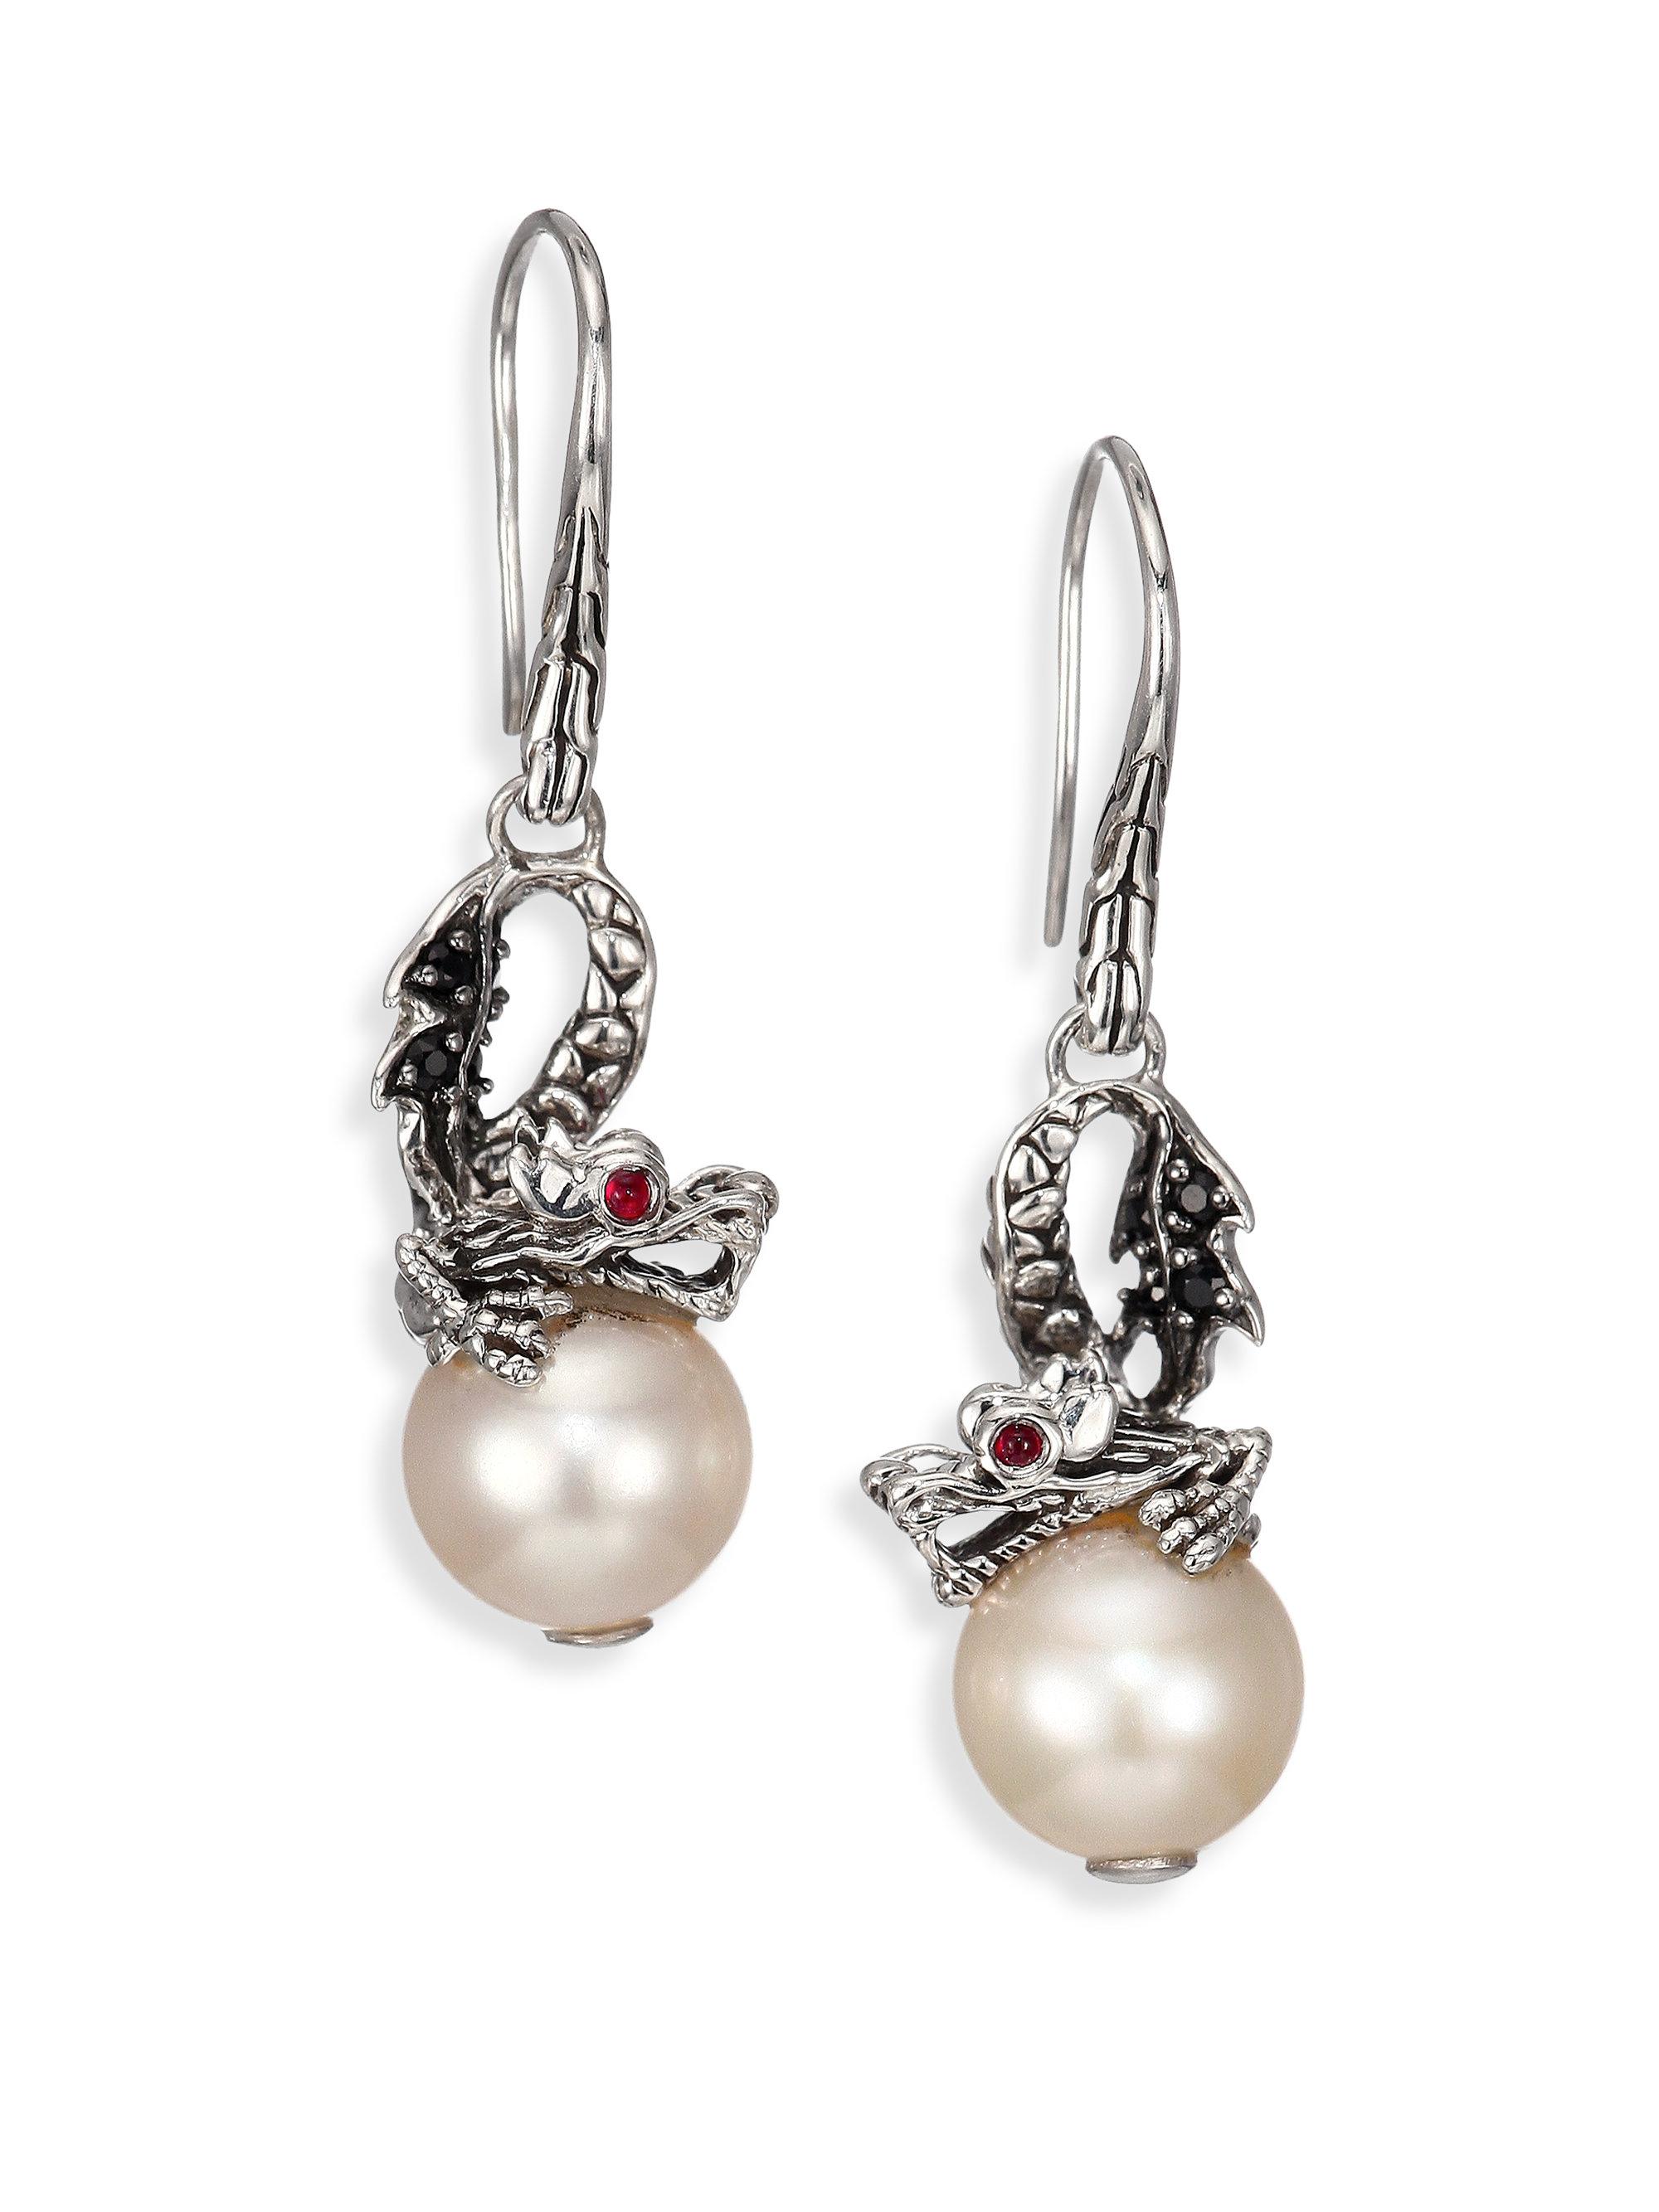 John Hardy Naga Silver Dragon Drop Earrings with Pearl & Black Sapphire 7OBK897L6